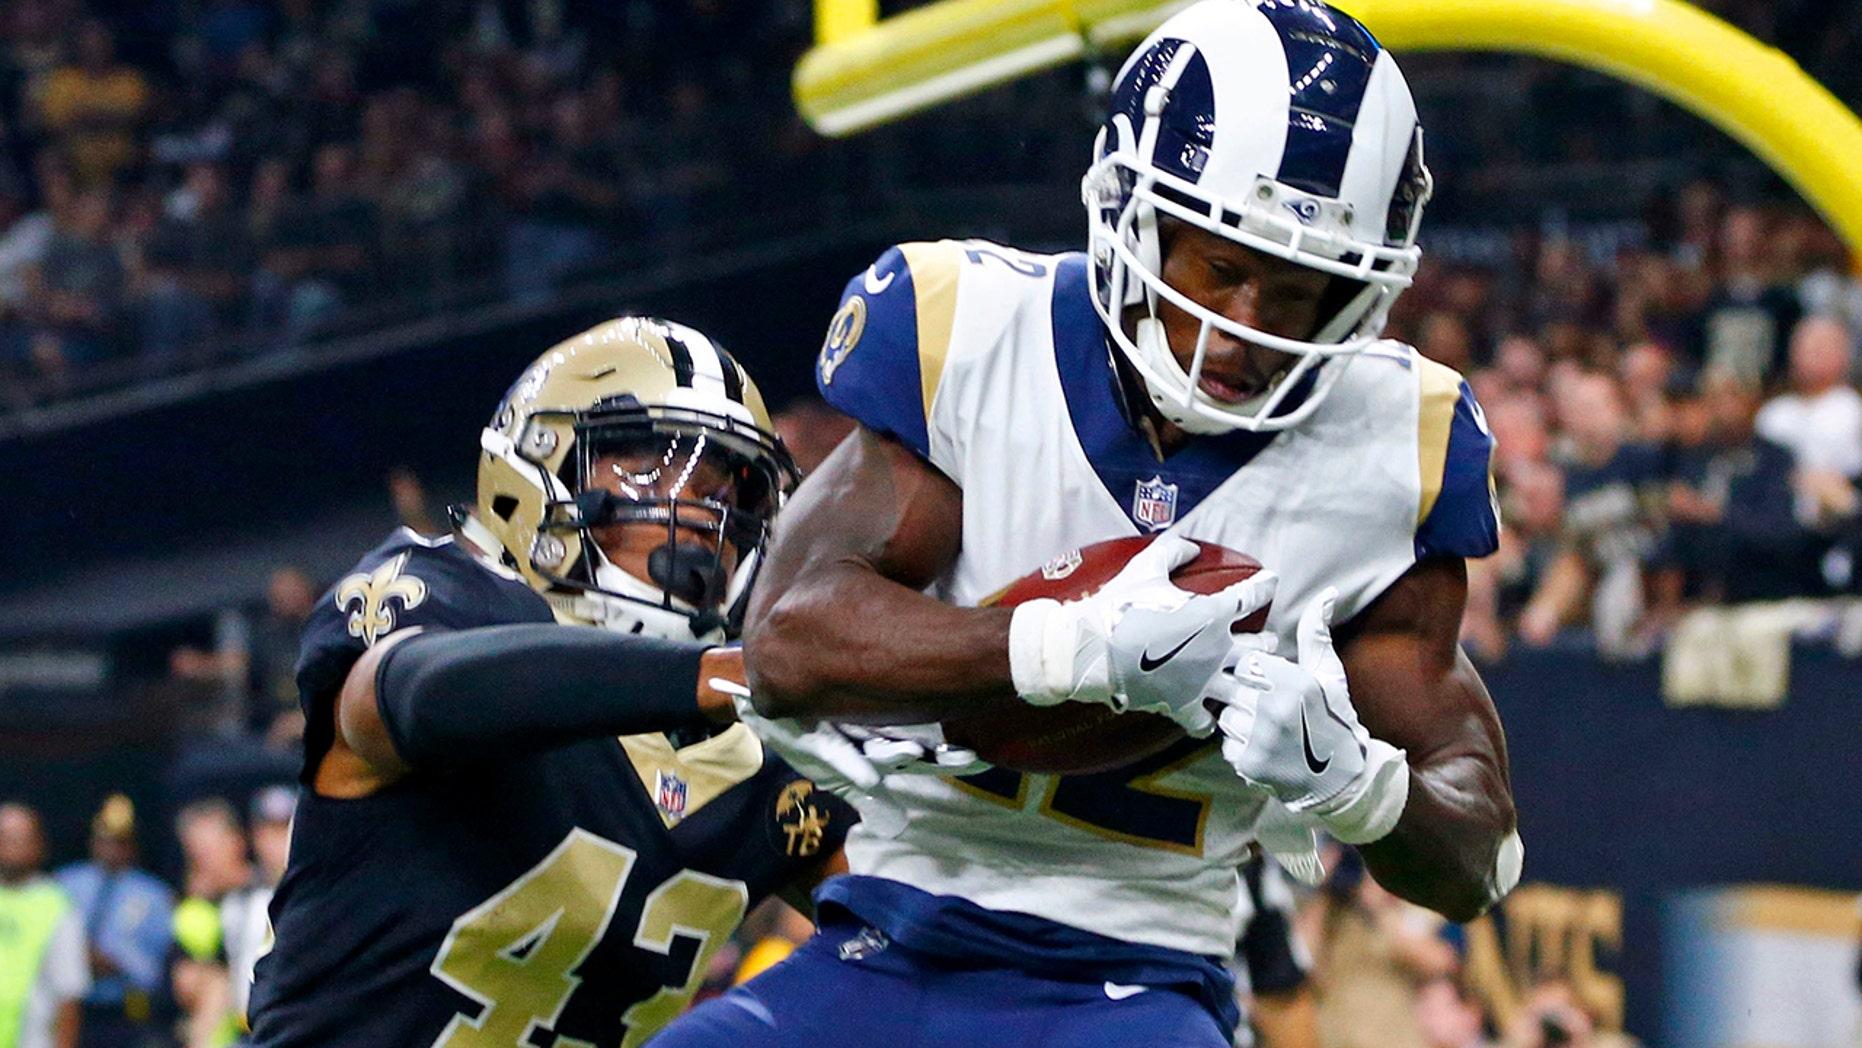 Brandin Cooks gave the Rams Custodian tickets for Super Bowl.